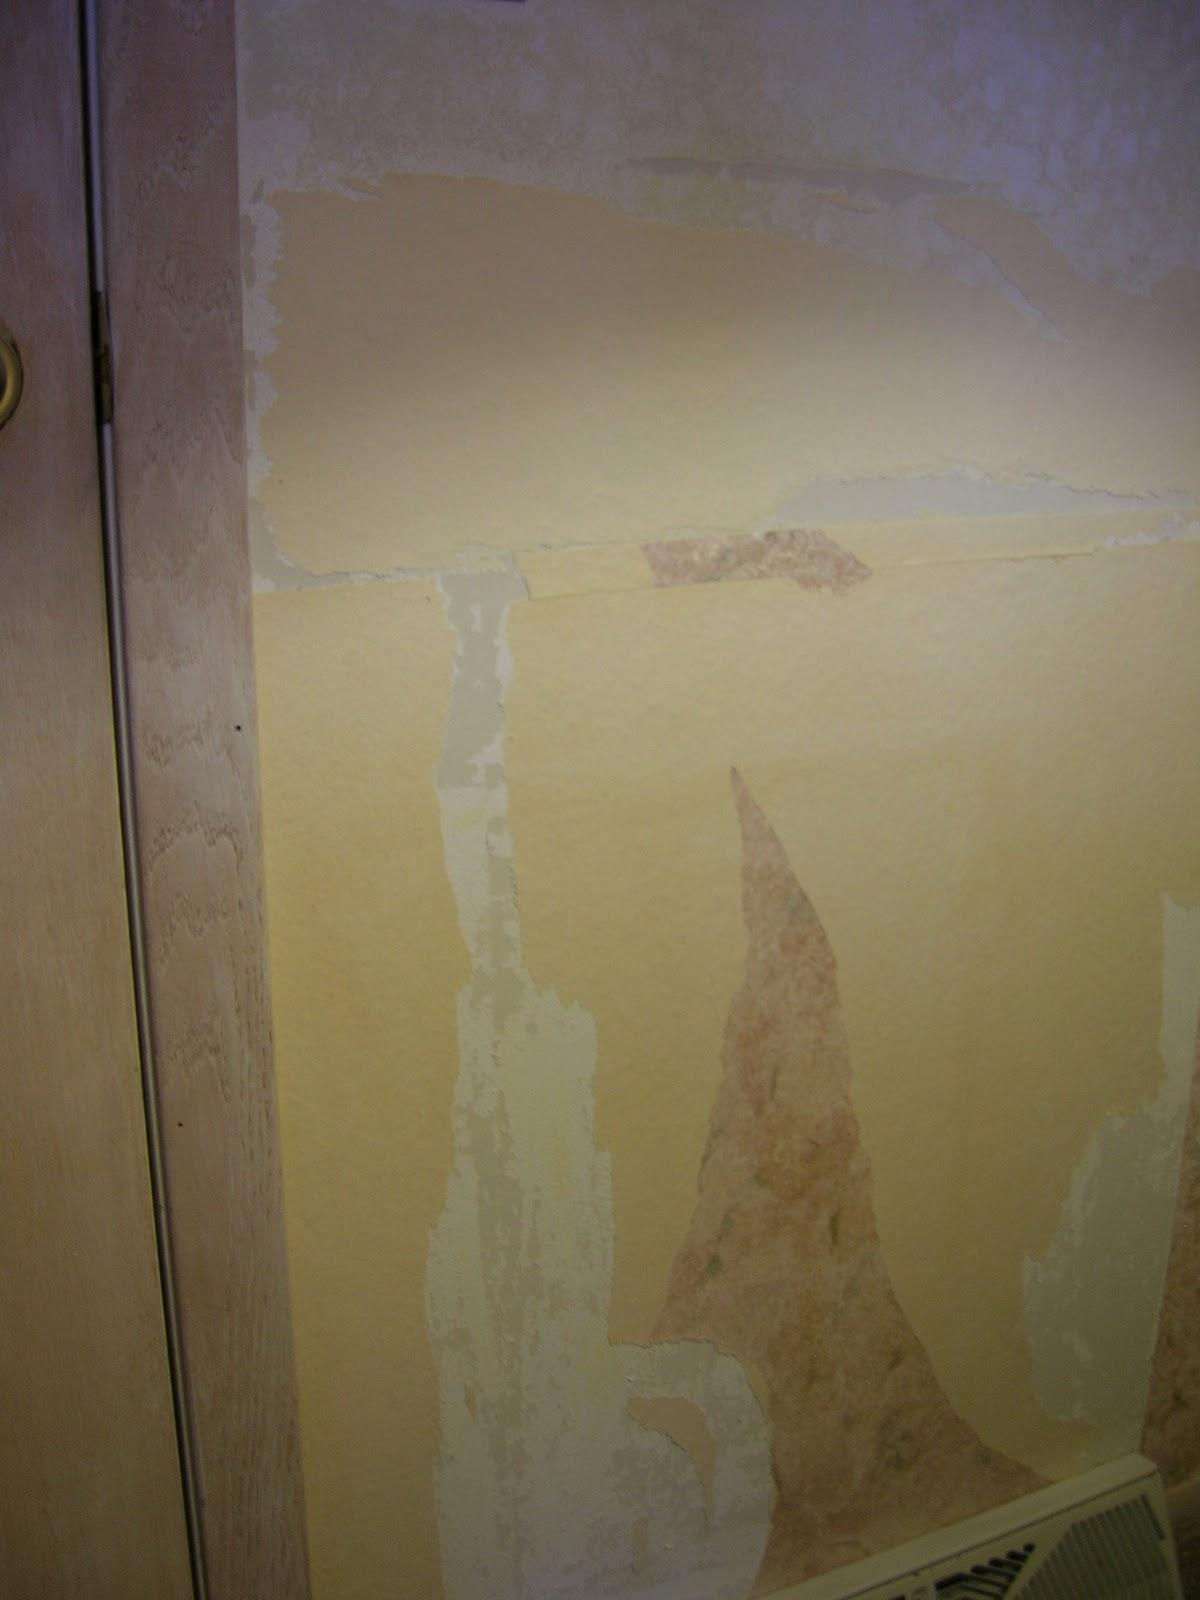 Zinsser Wallpaper Cover Up Wallpapersafari